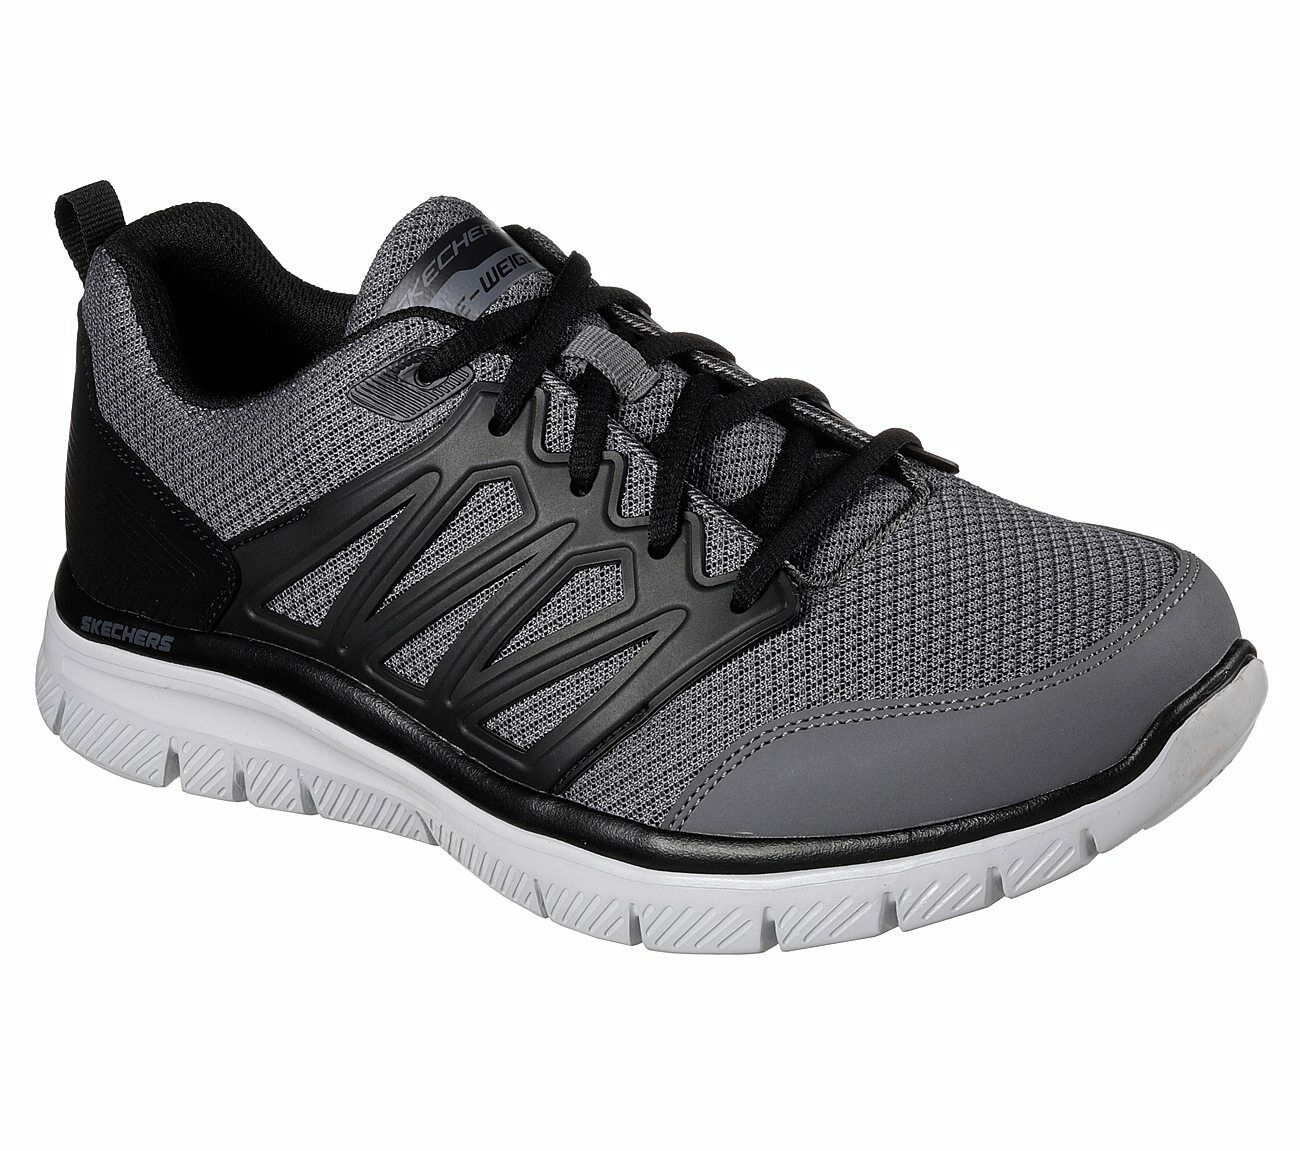 8b0d068abfe 58353 Gray Skechers shoes Men Comfort Casual Soft Mesh Train Train Train  Sporty Memory Foam 07d06b